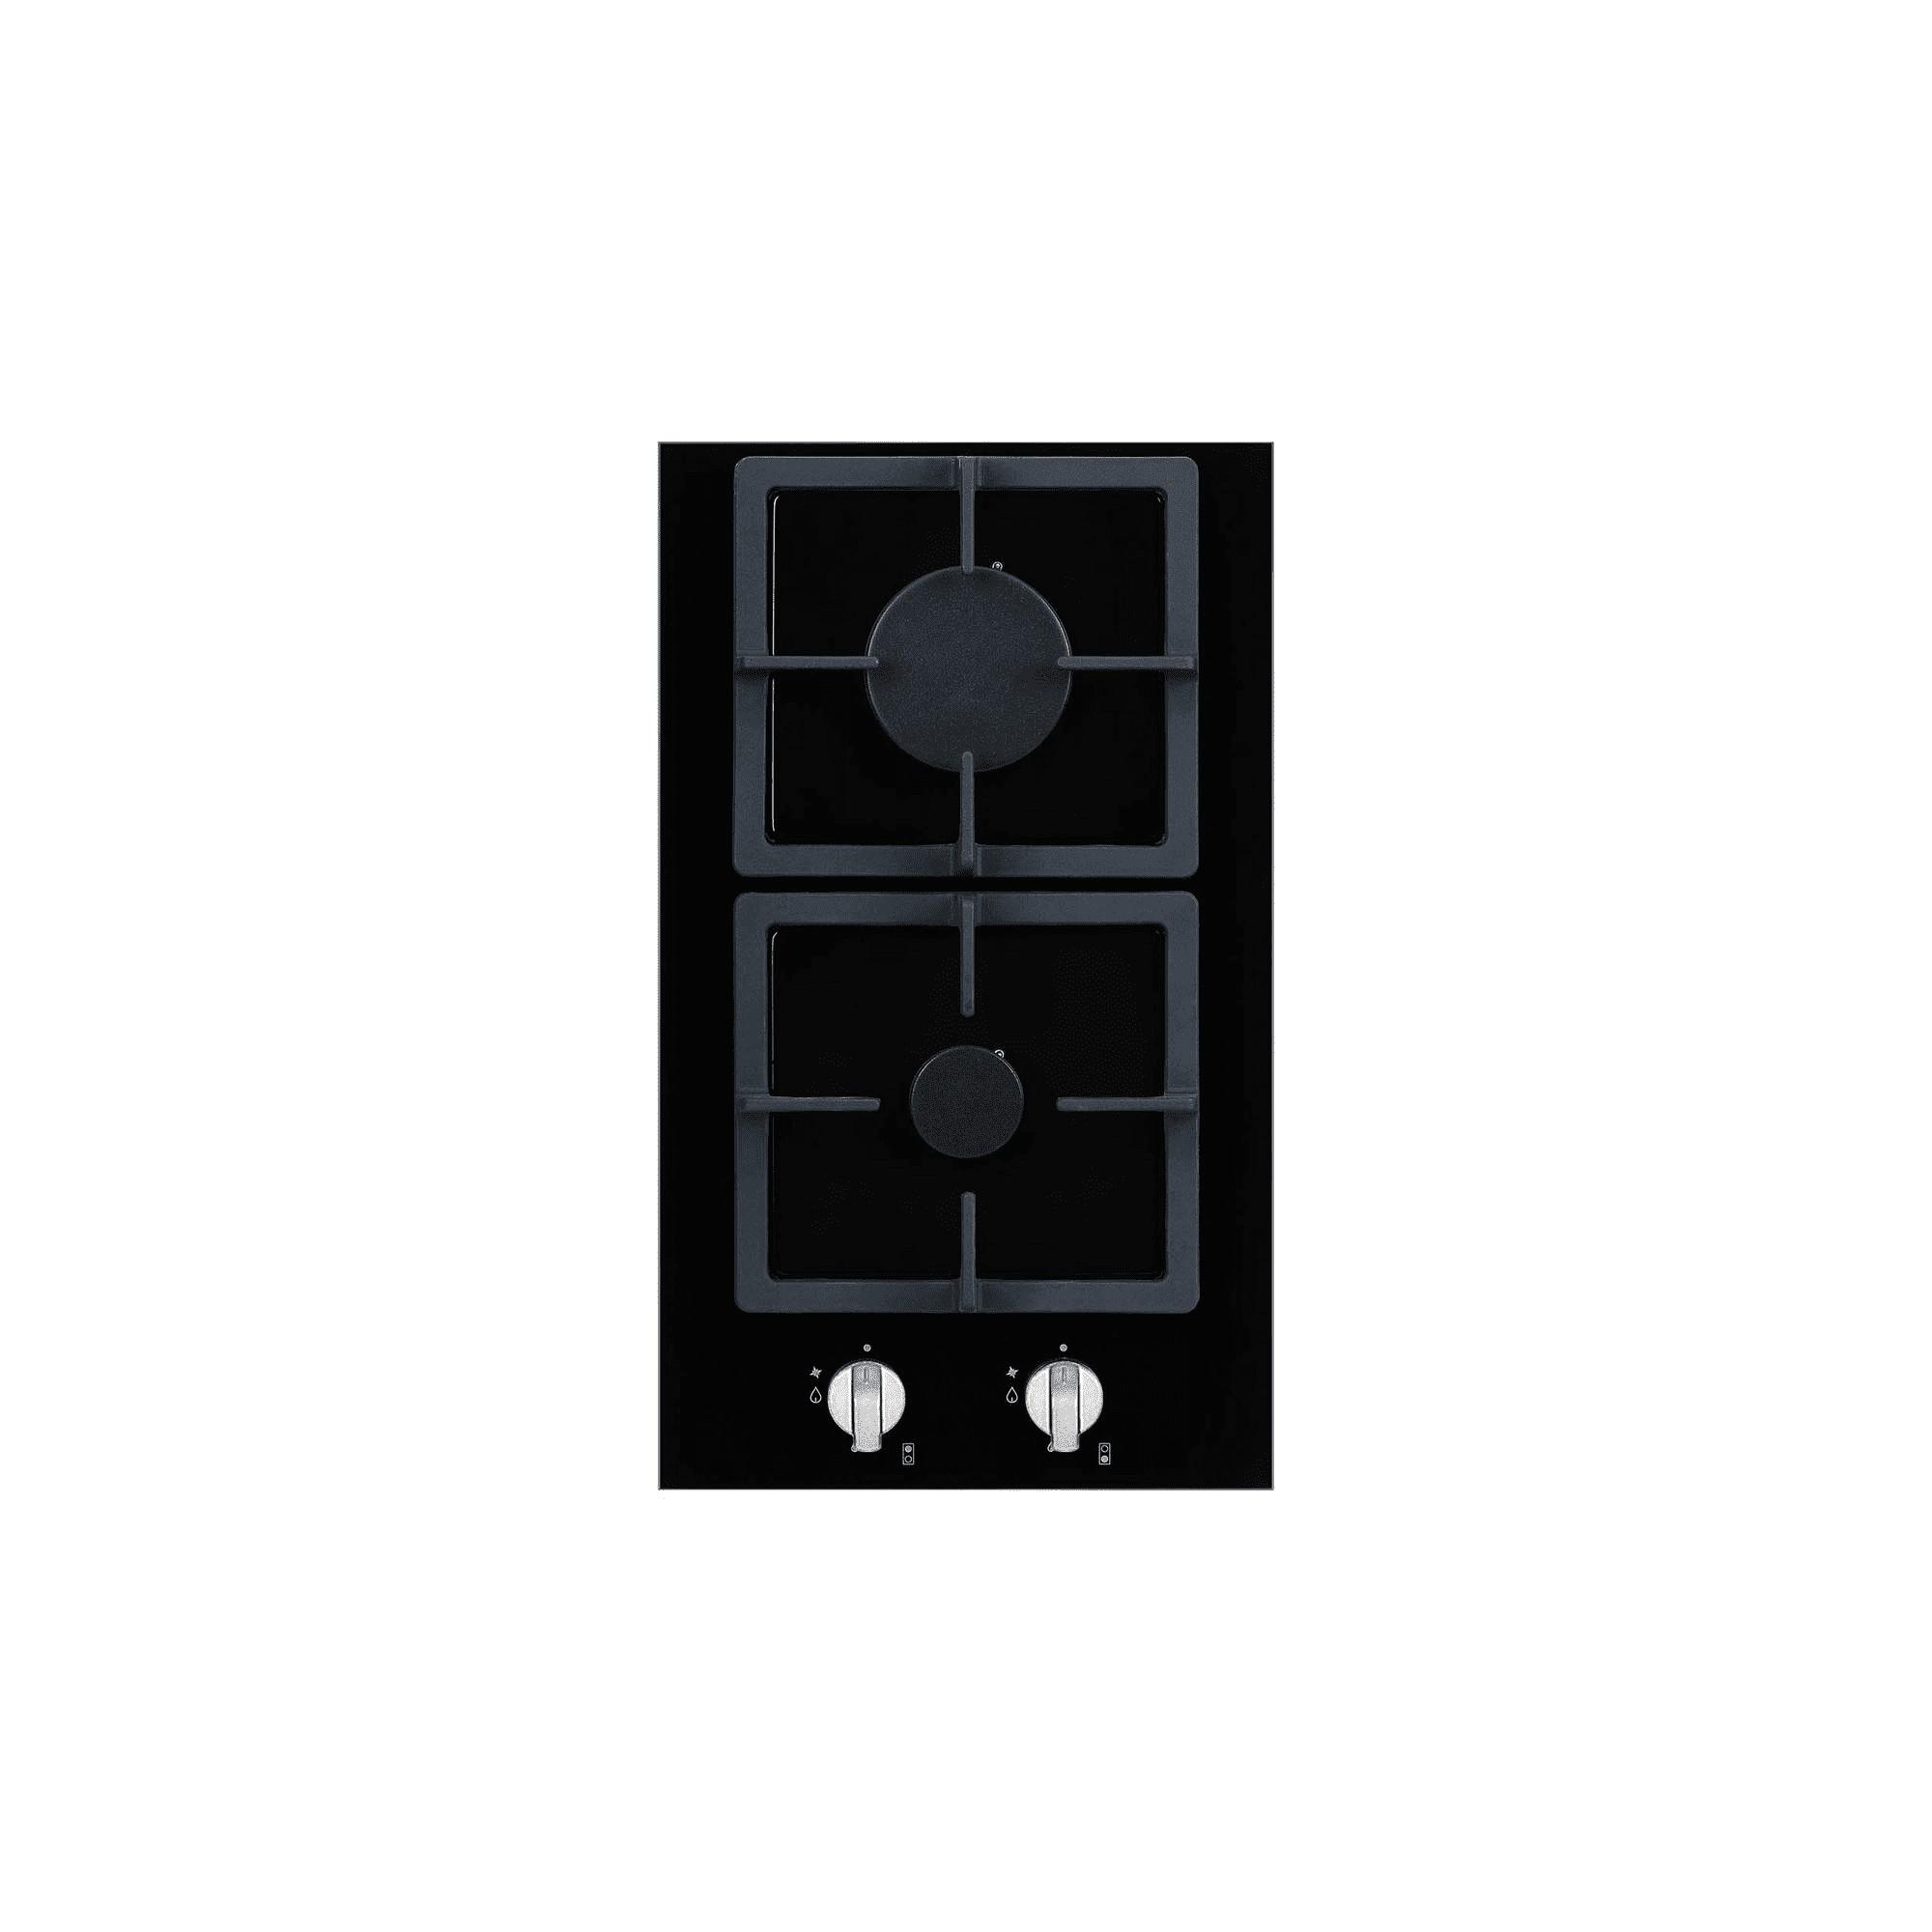 http://www.bbplace.fr/255-733-thickbox/domino-gaz-curtiss-rg24lg.jpg